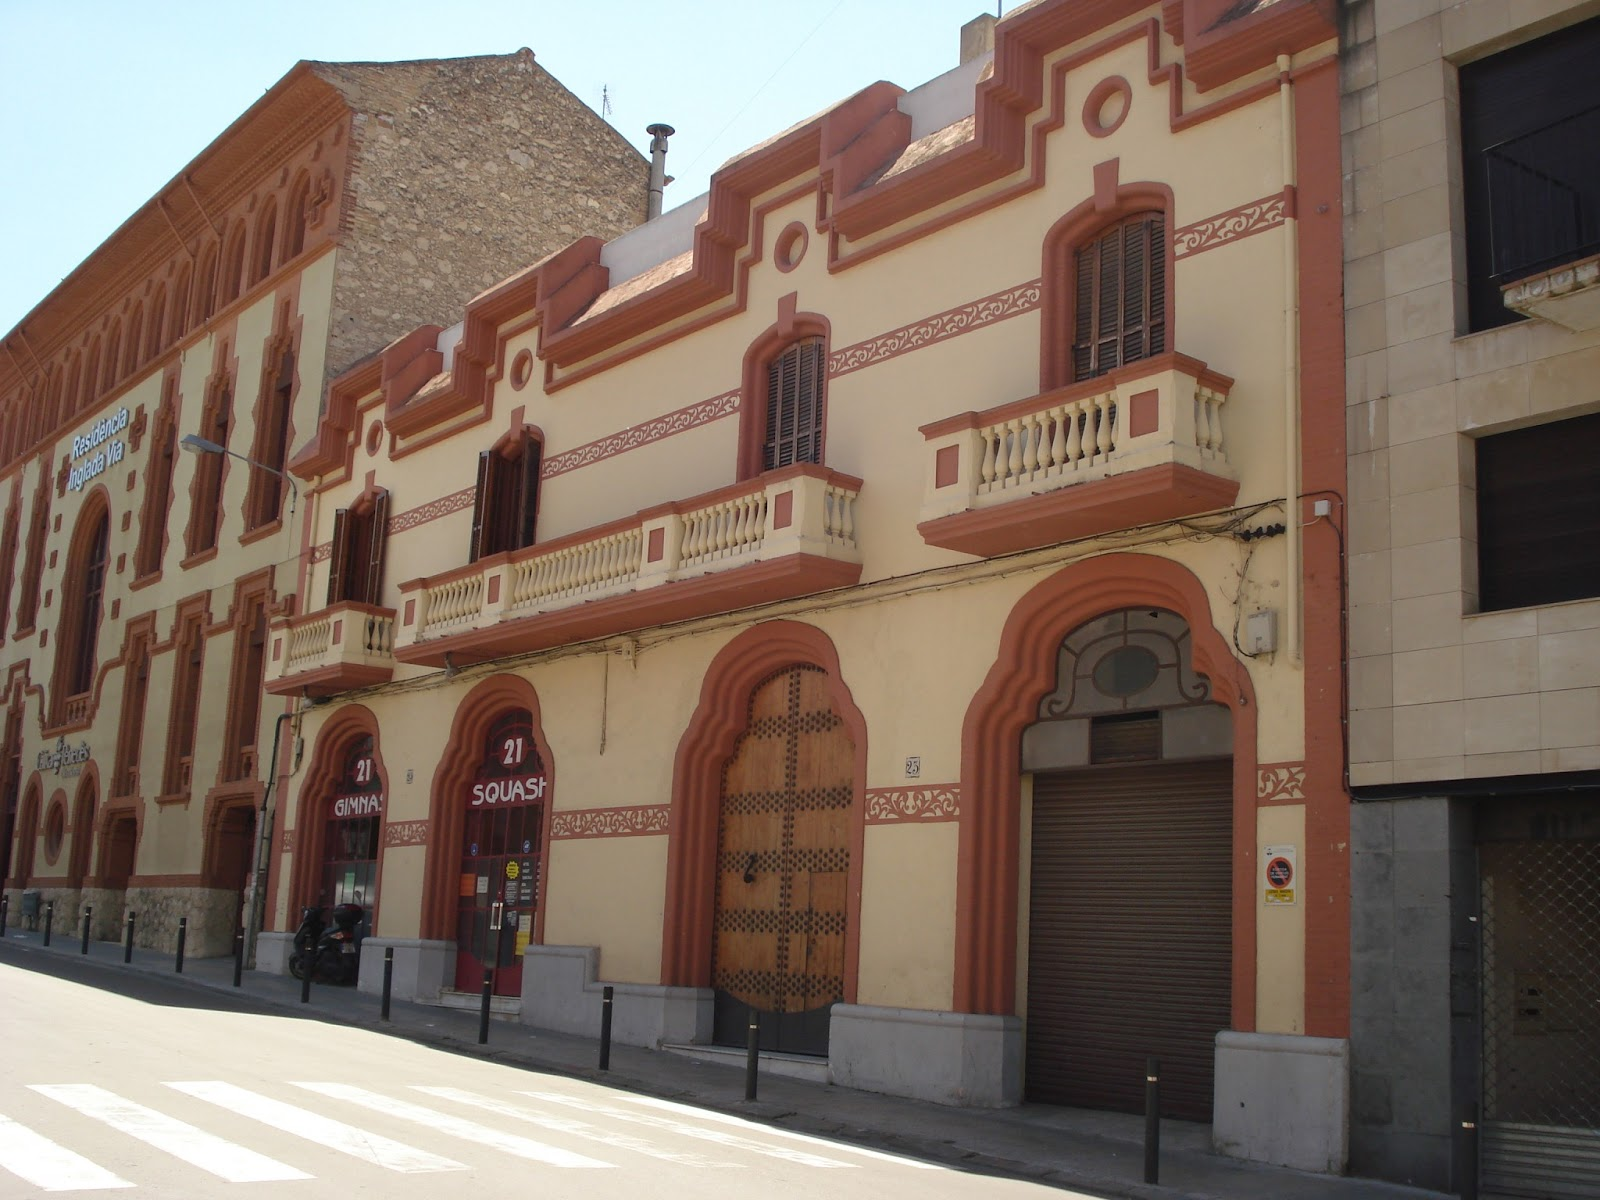 Relat casa vicen mestres tauler de vilafranca del pened s for Morato vilafranca